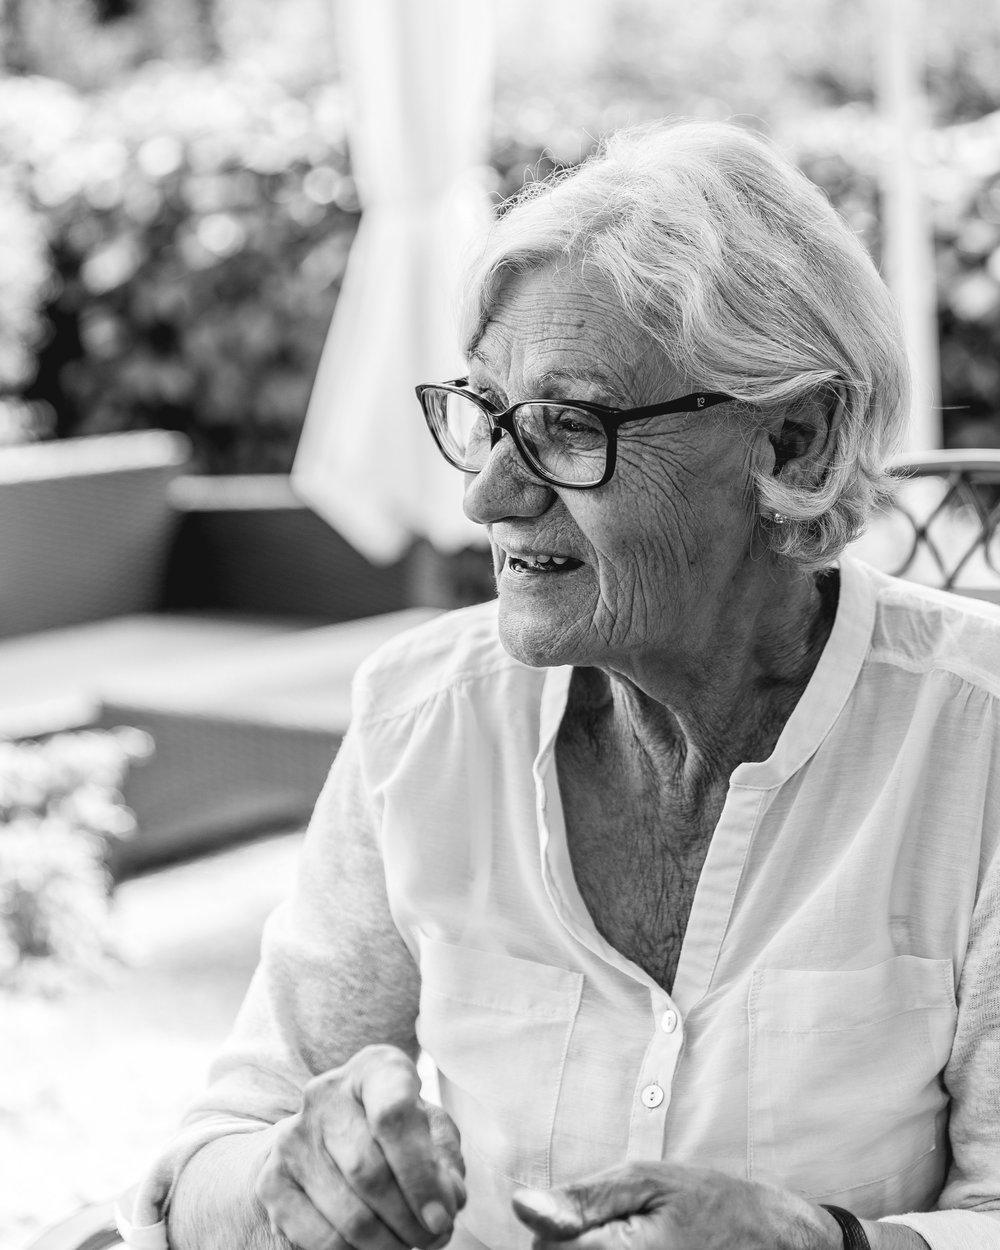 N° 5 Beatrice Ruth Brianza   *2. Januar 1944 - Betreuerin, Hausfrau und Mutter